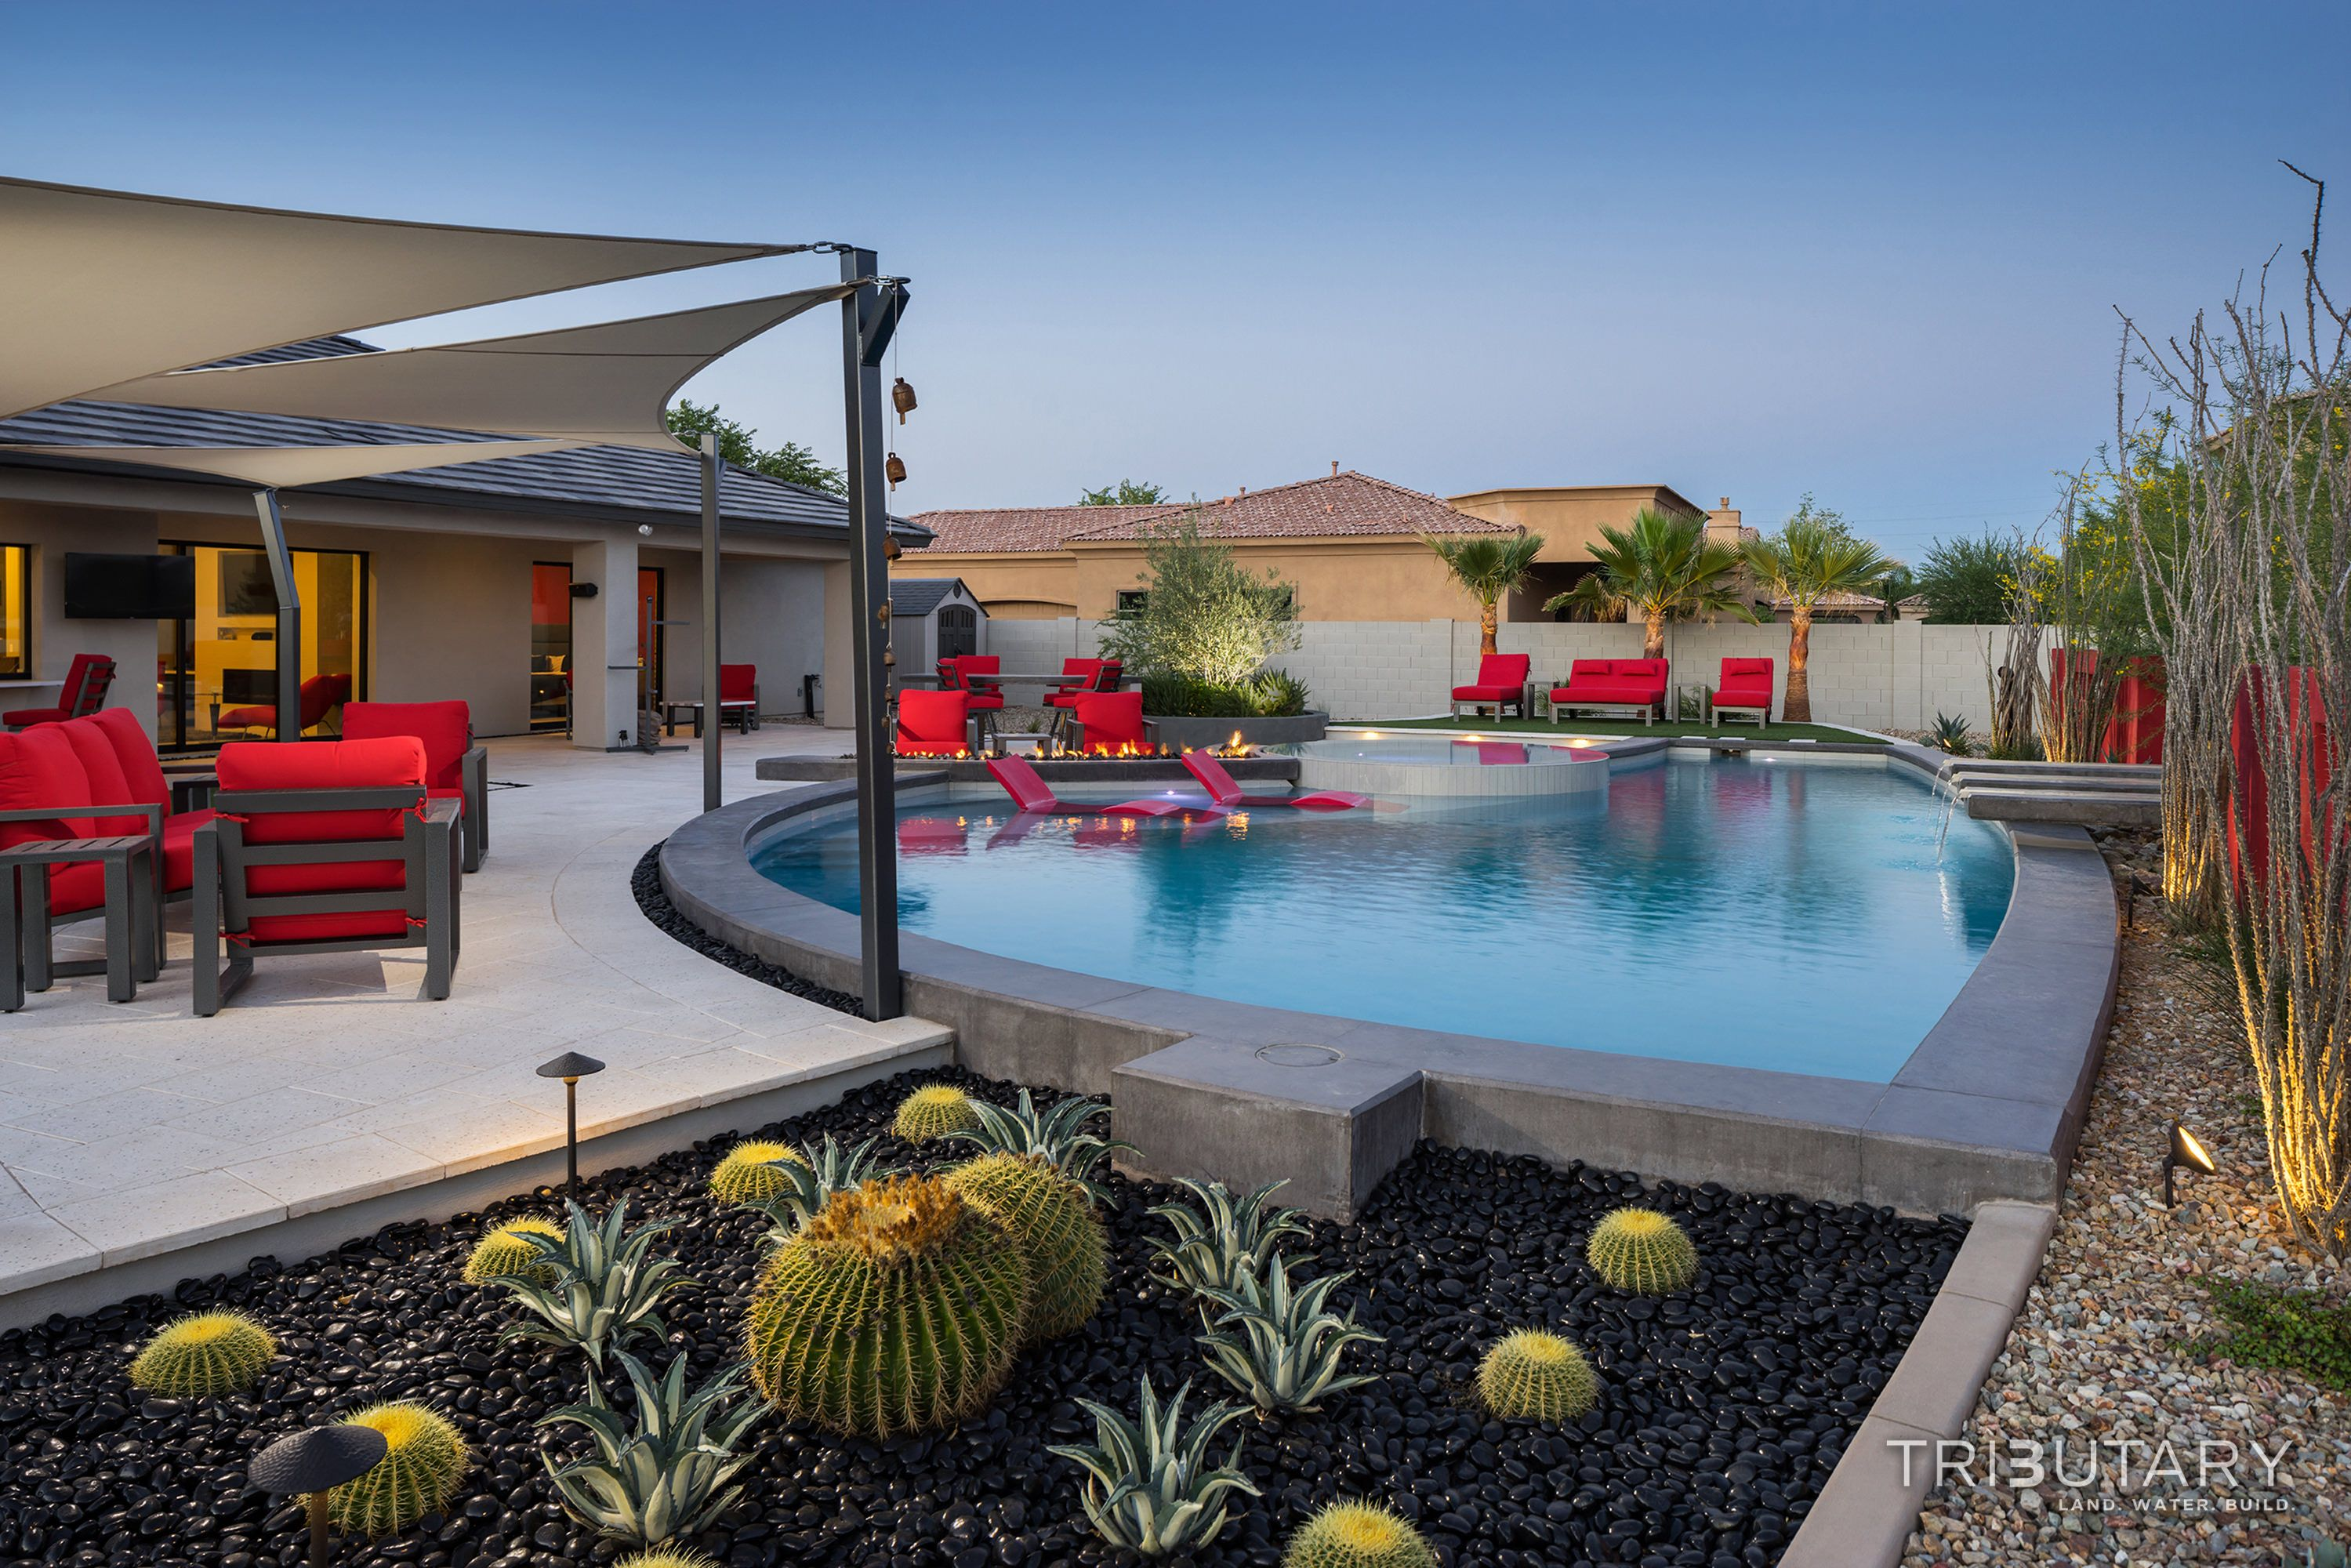 Tributary Pools Custom Pool Sleek Oasis Gilbert Diy Network Pool Kings Gilbert Arizona Paradise Luxury Pool Jeromey Naugl In 2020 Luxury Pools Custom Pools Luxury Pool